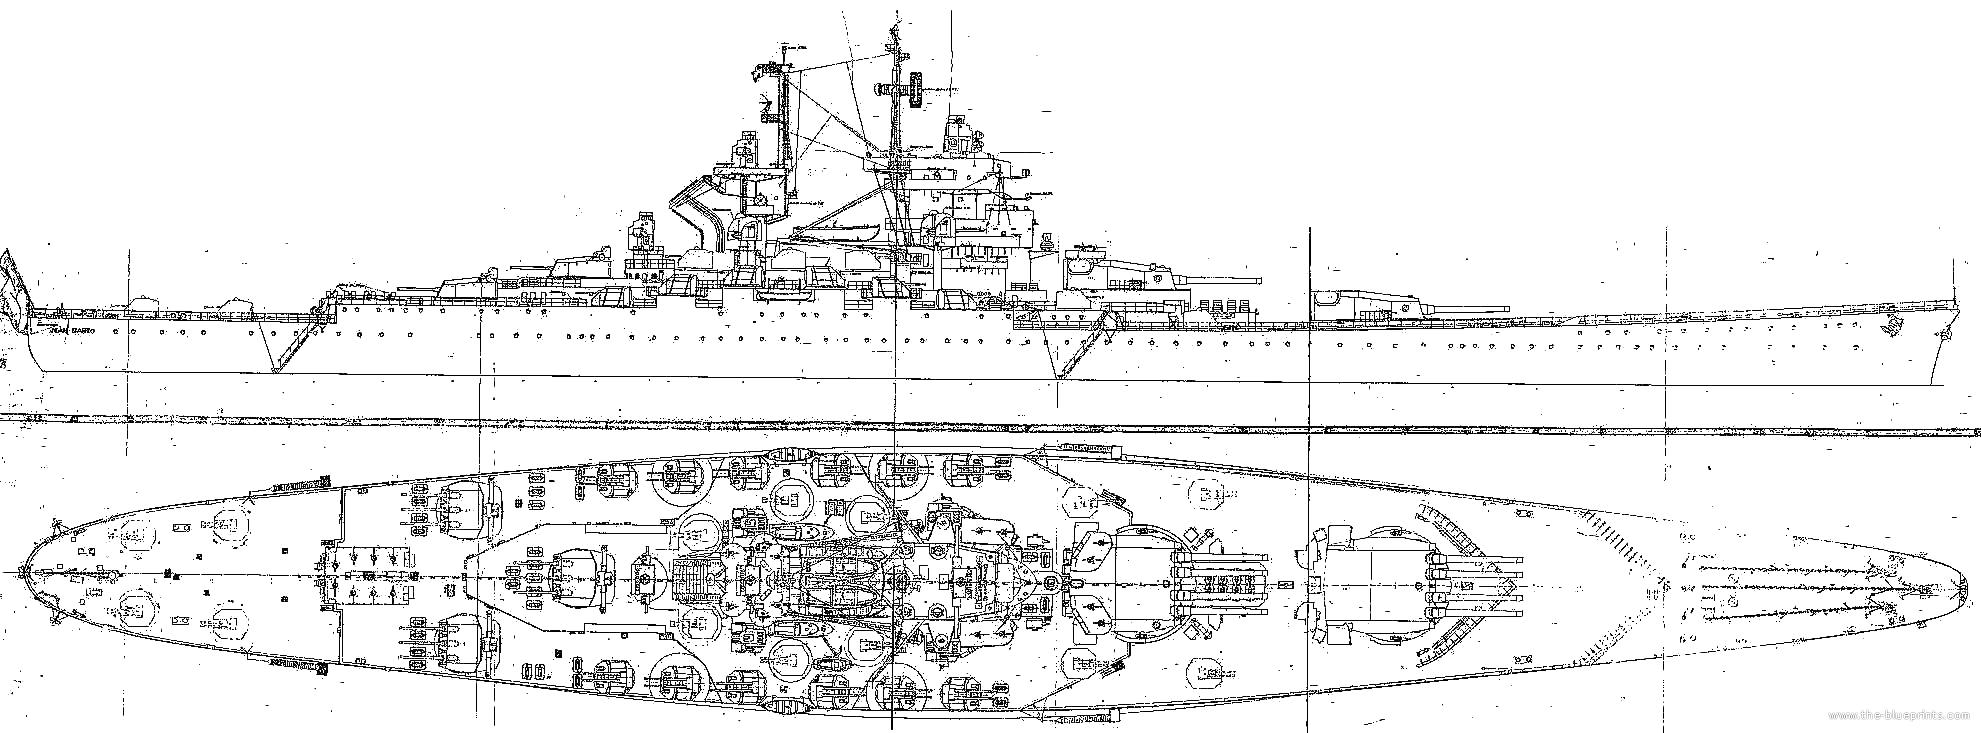 medium resolution of image result for iowa class battleship hull designs